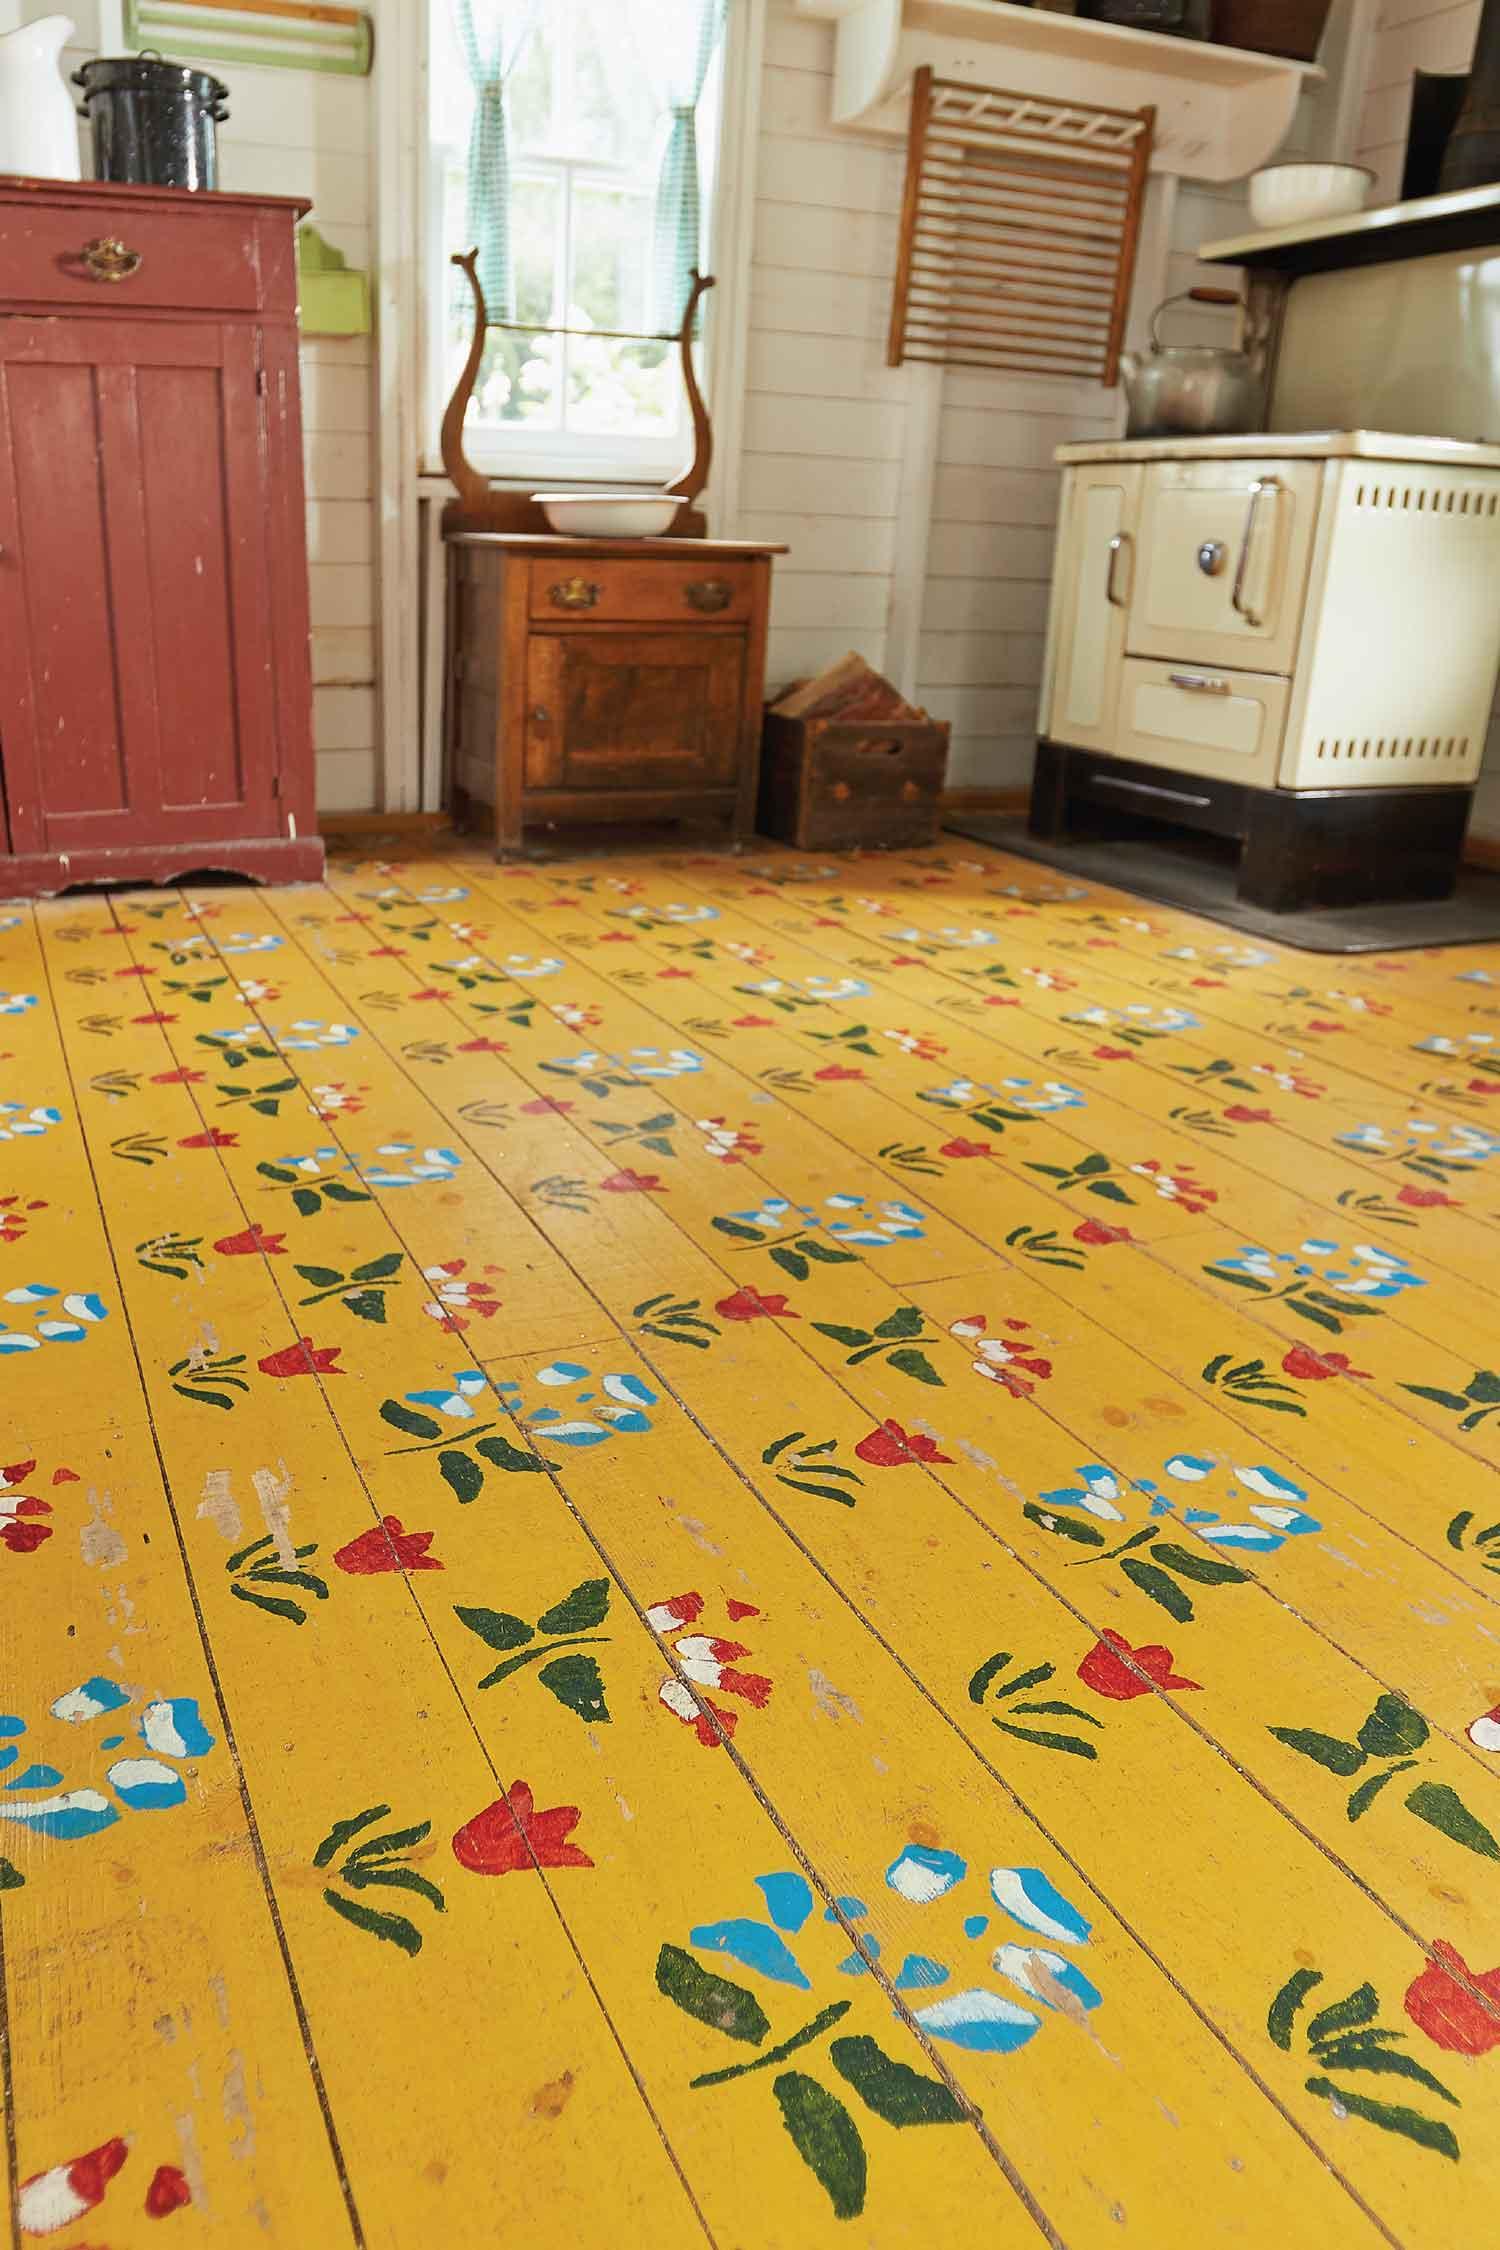 A replica of the Sommerfeld housebarn floor pattern, at the Mennonite Heritage Village, Steinbach, Manitoba, handpainted by M. Krahn, 2010.